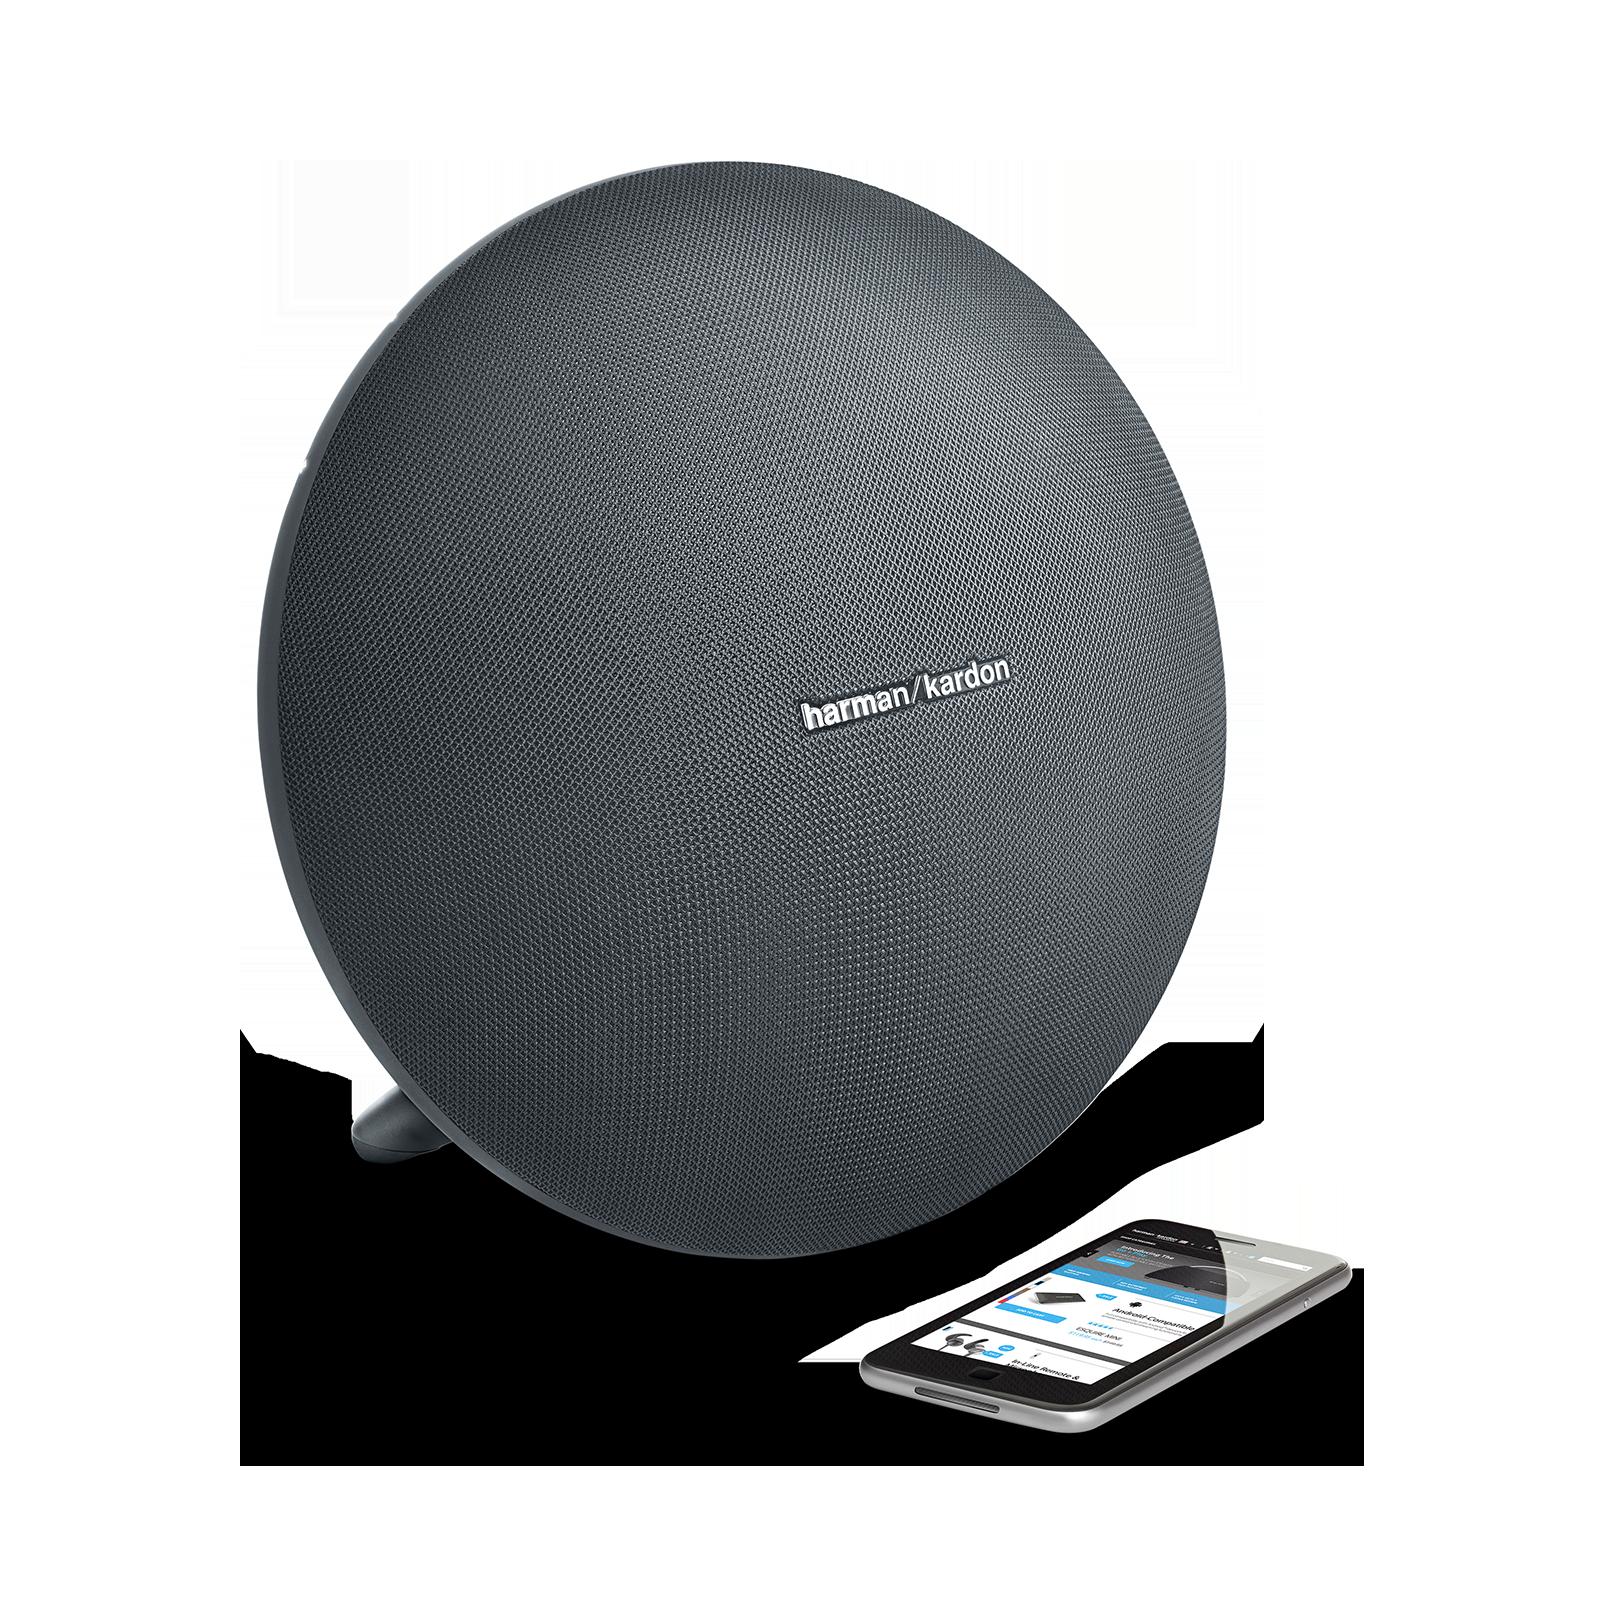 Onyx Studio 3 - Grey - Portable Bluetooth Speaker - Detailshot 1